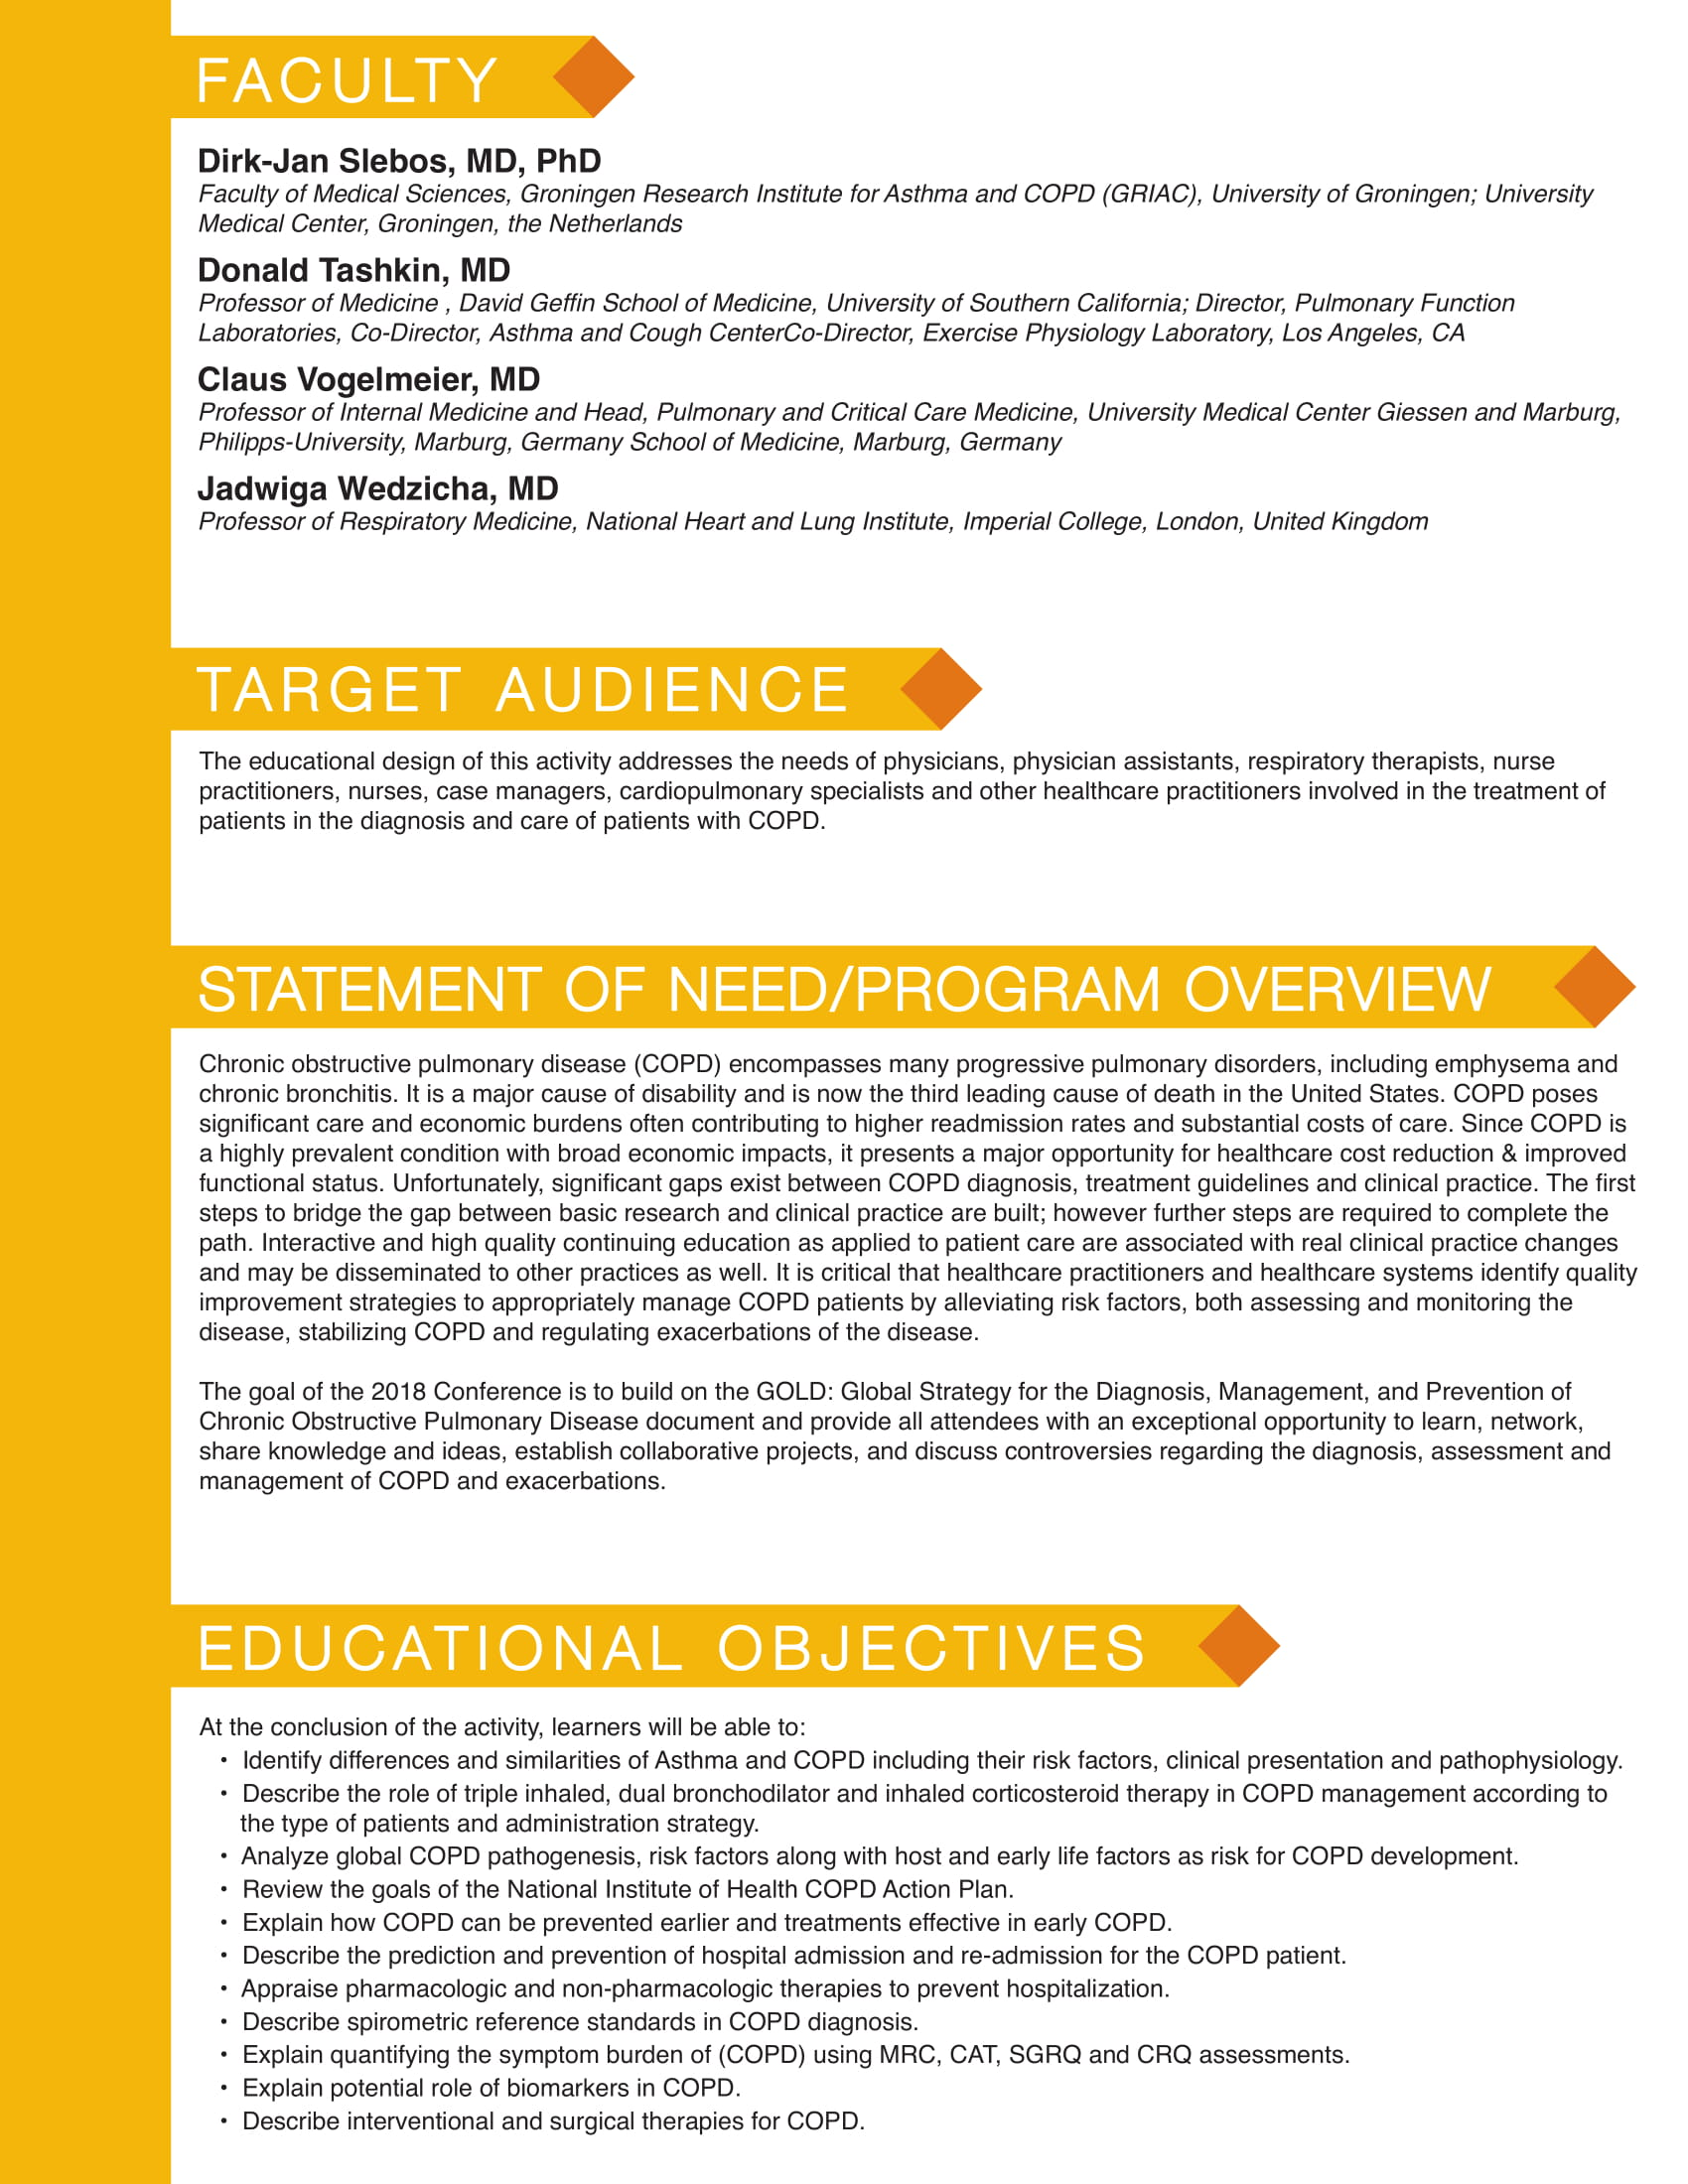 2018 International COPD Attendee Brochure 927Final (1)-4